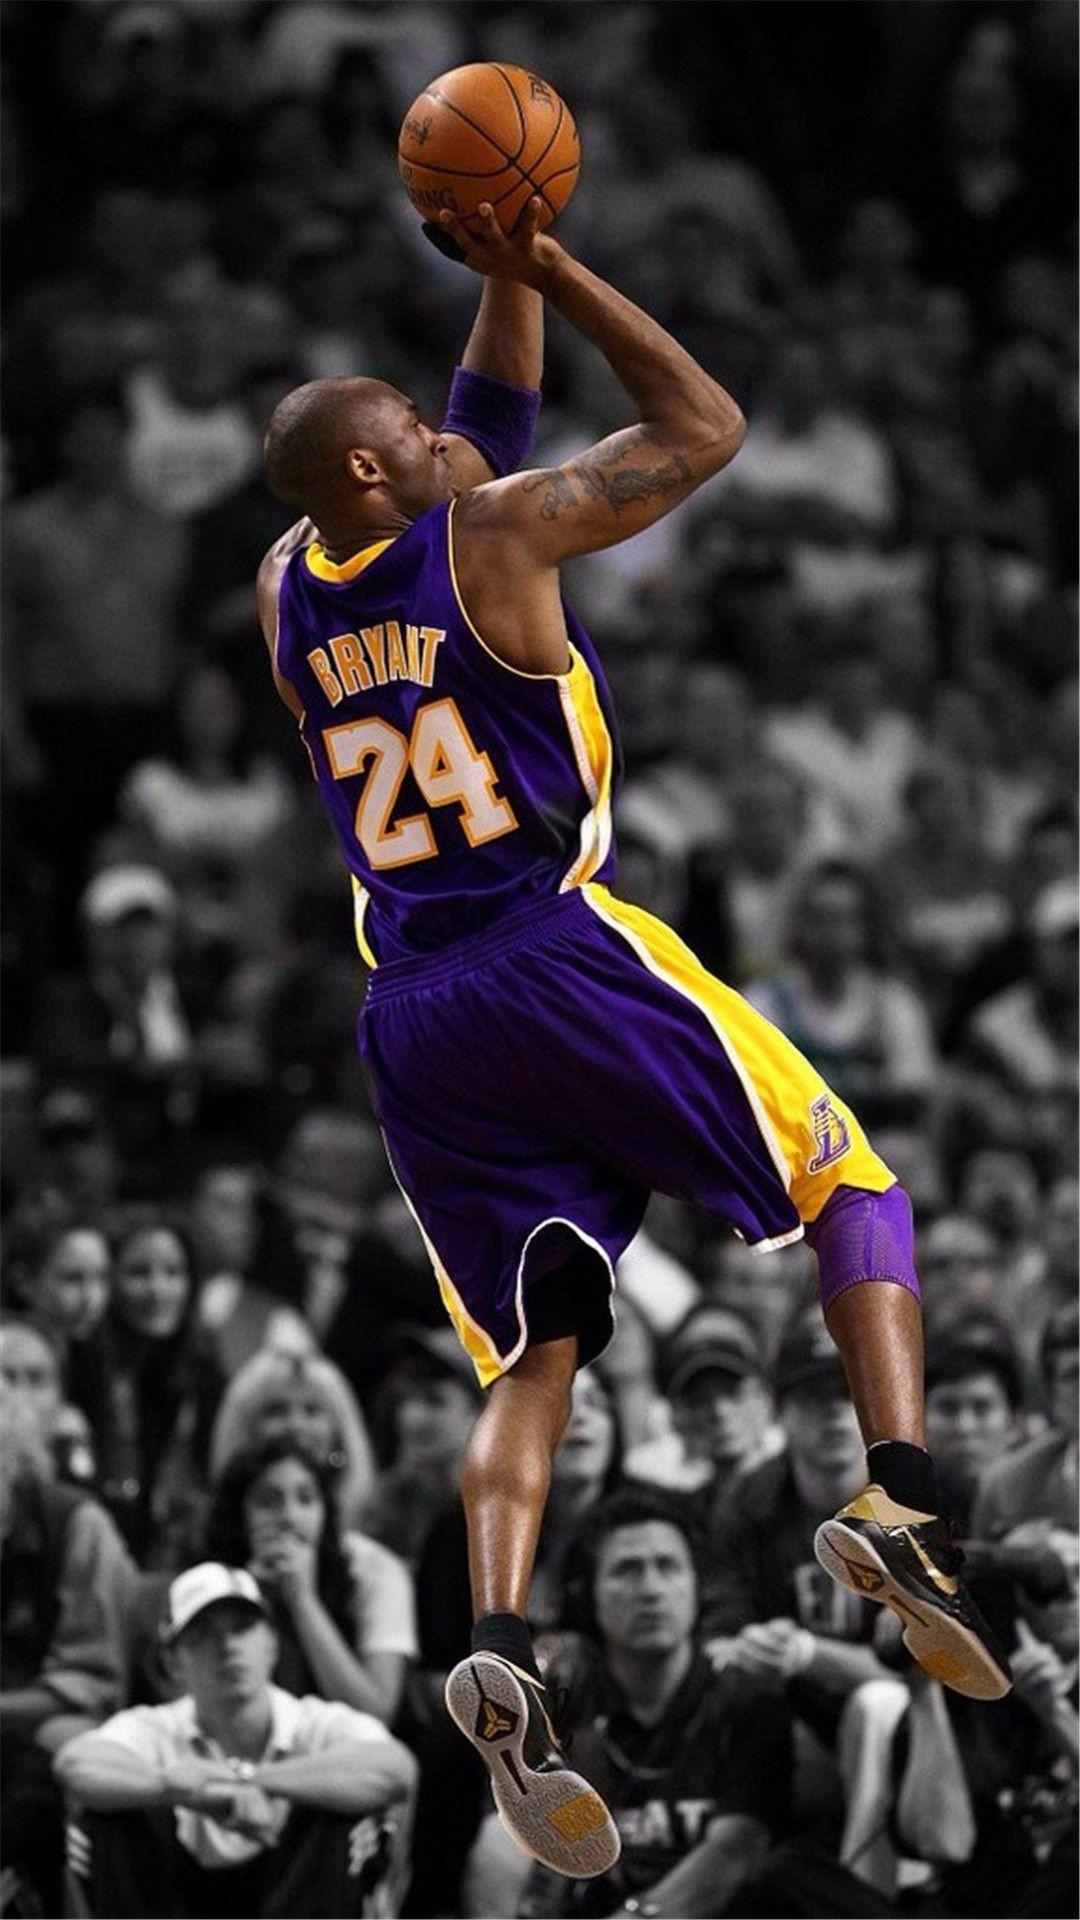 Res: 1080x1920, NBA Super Star Brant Kobe Show iPhone 6 wallpaper